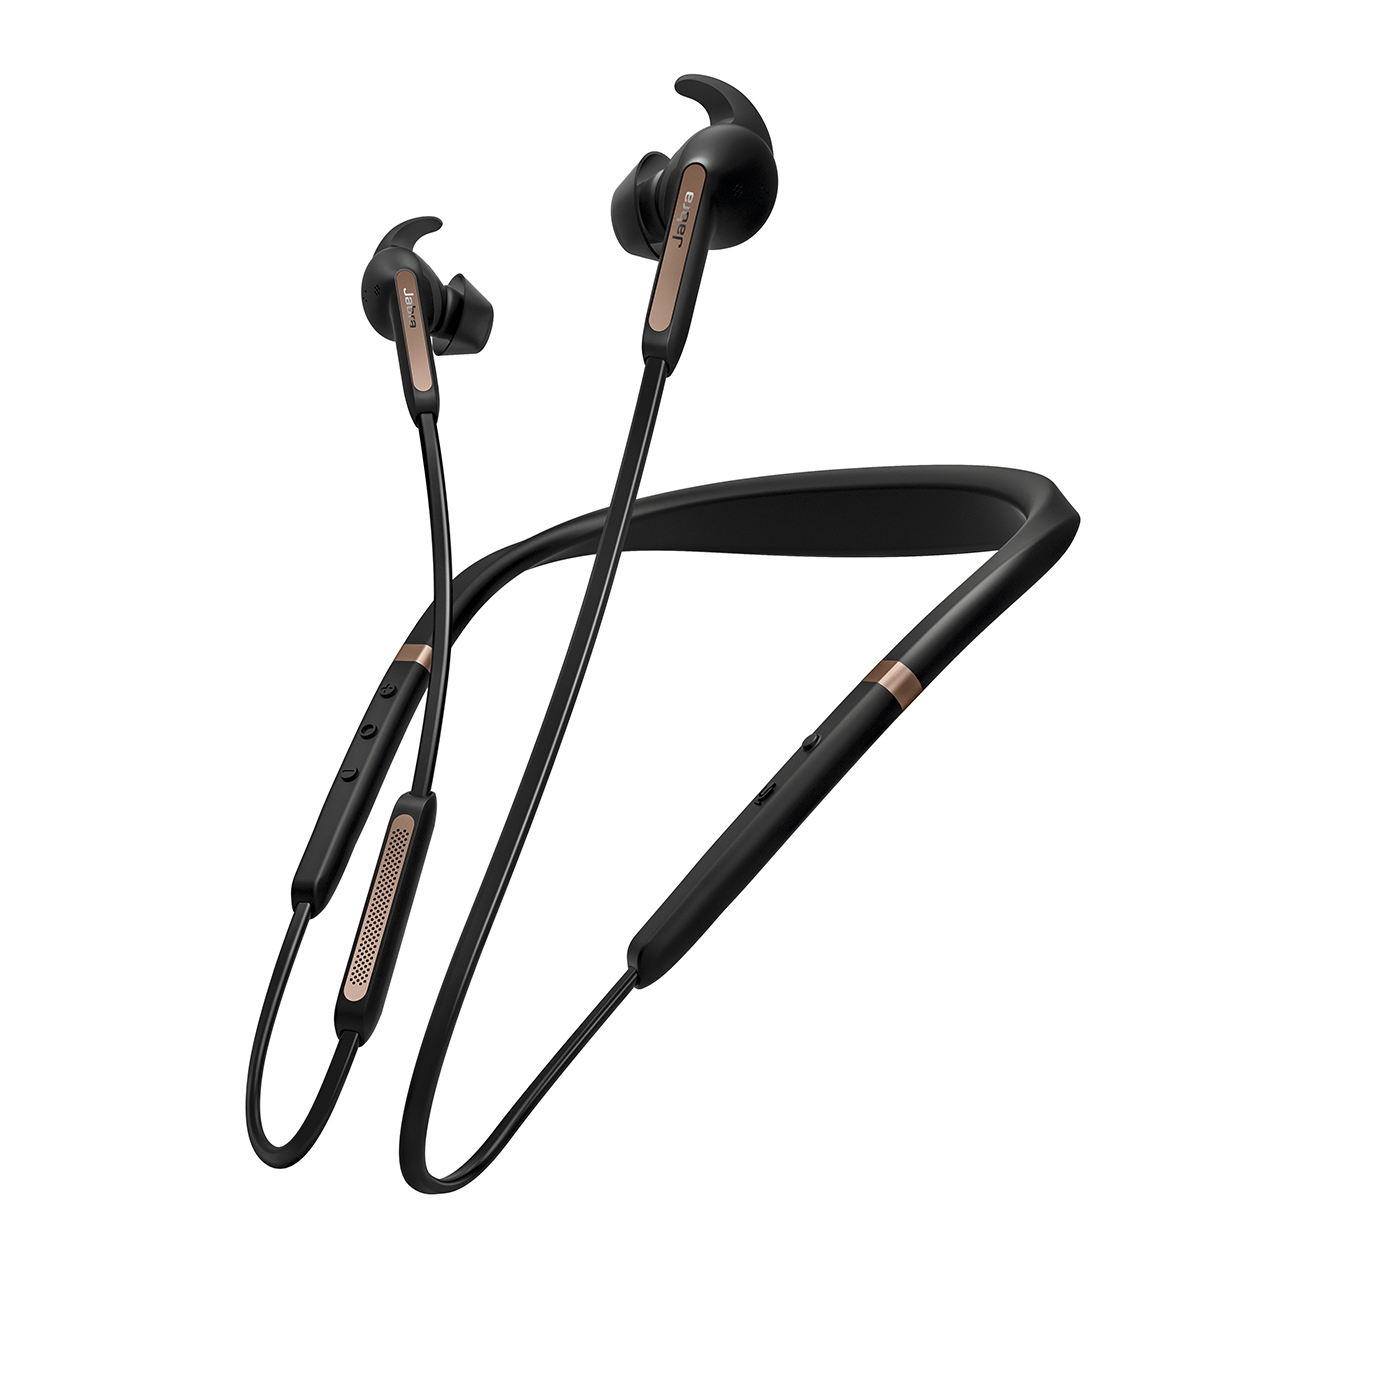 Jabra Elite 65e Alexa Wireless Neckband ANC Earbuds (Manufacturer Refurbished) Copper Black